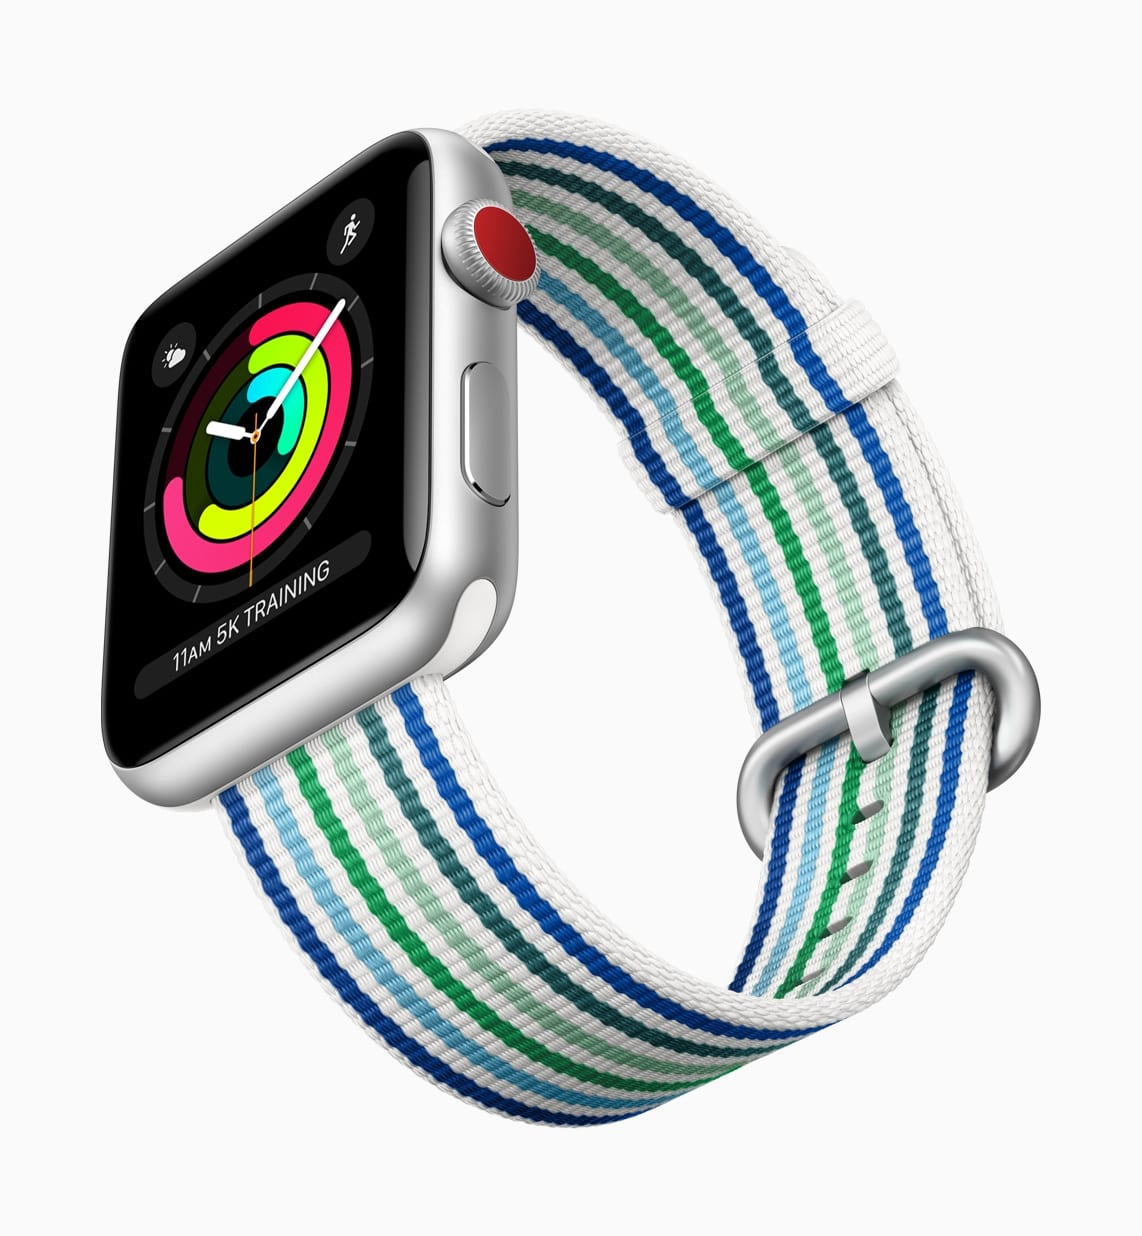 apple watch nylon jar 2018